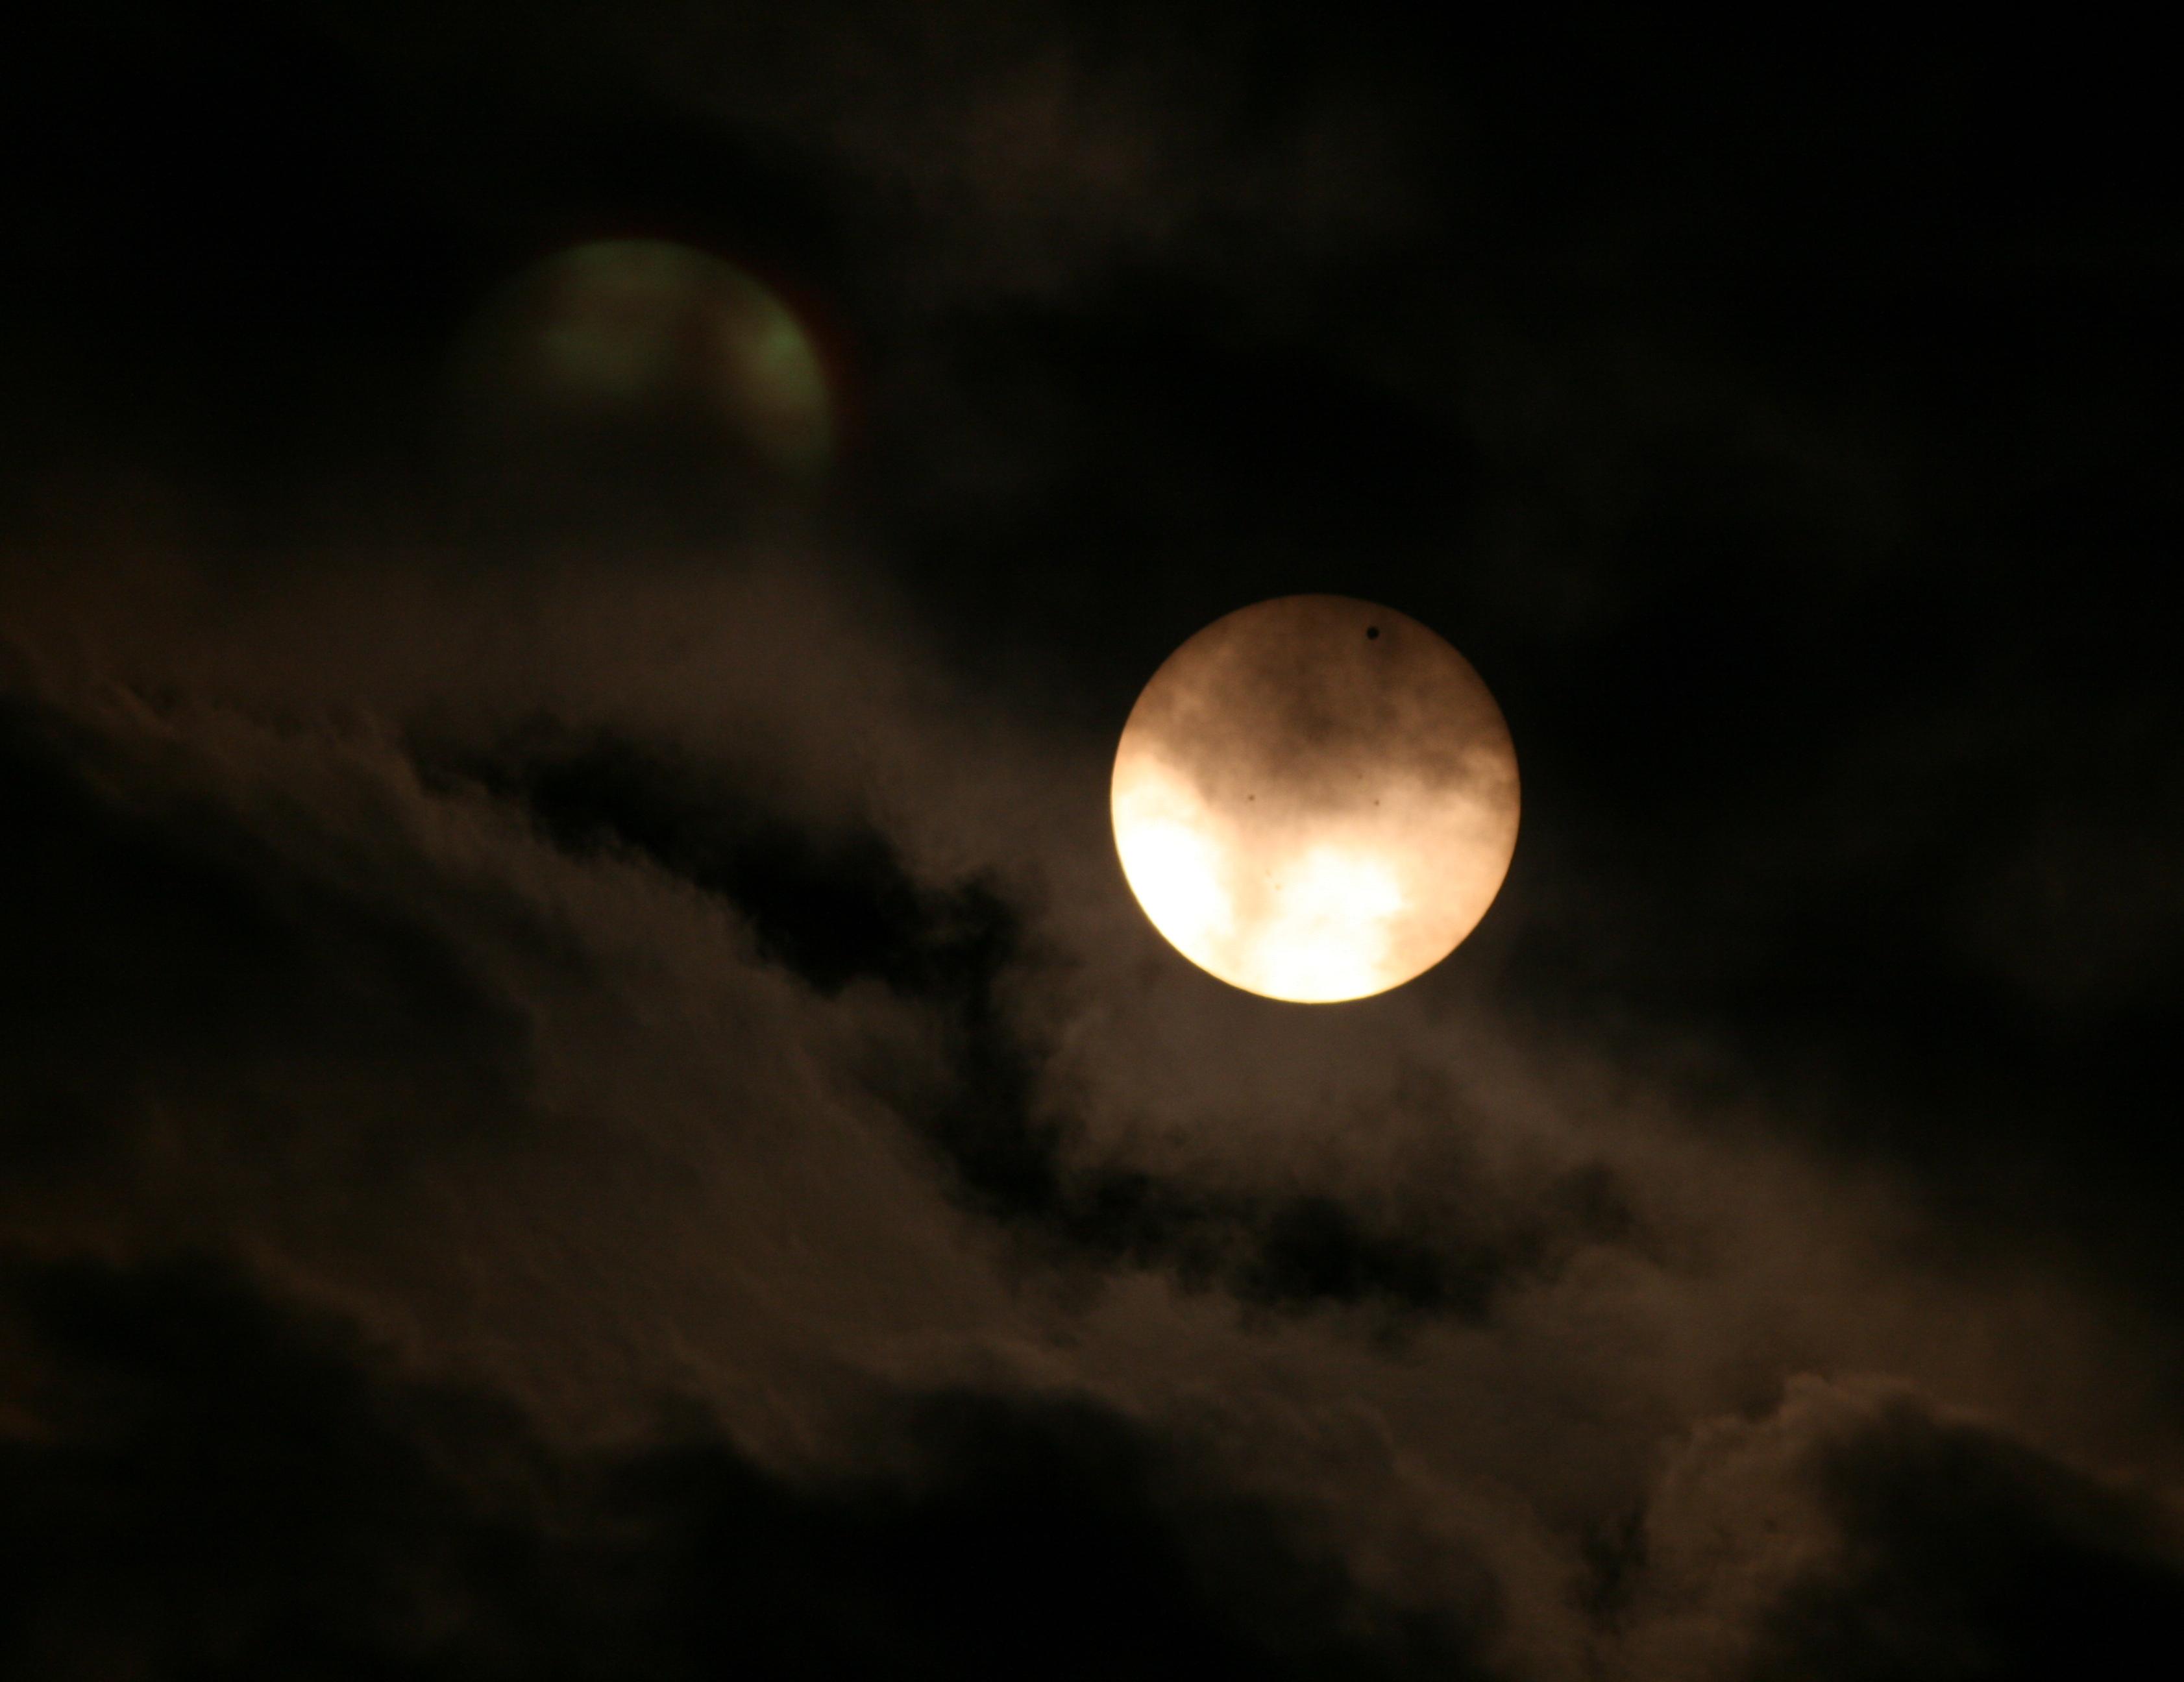 Wallpaper : night, nature, space, sky, Moon, moonlight, Mars